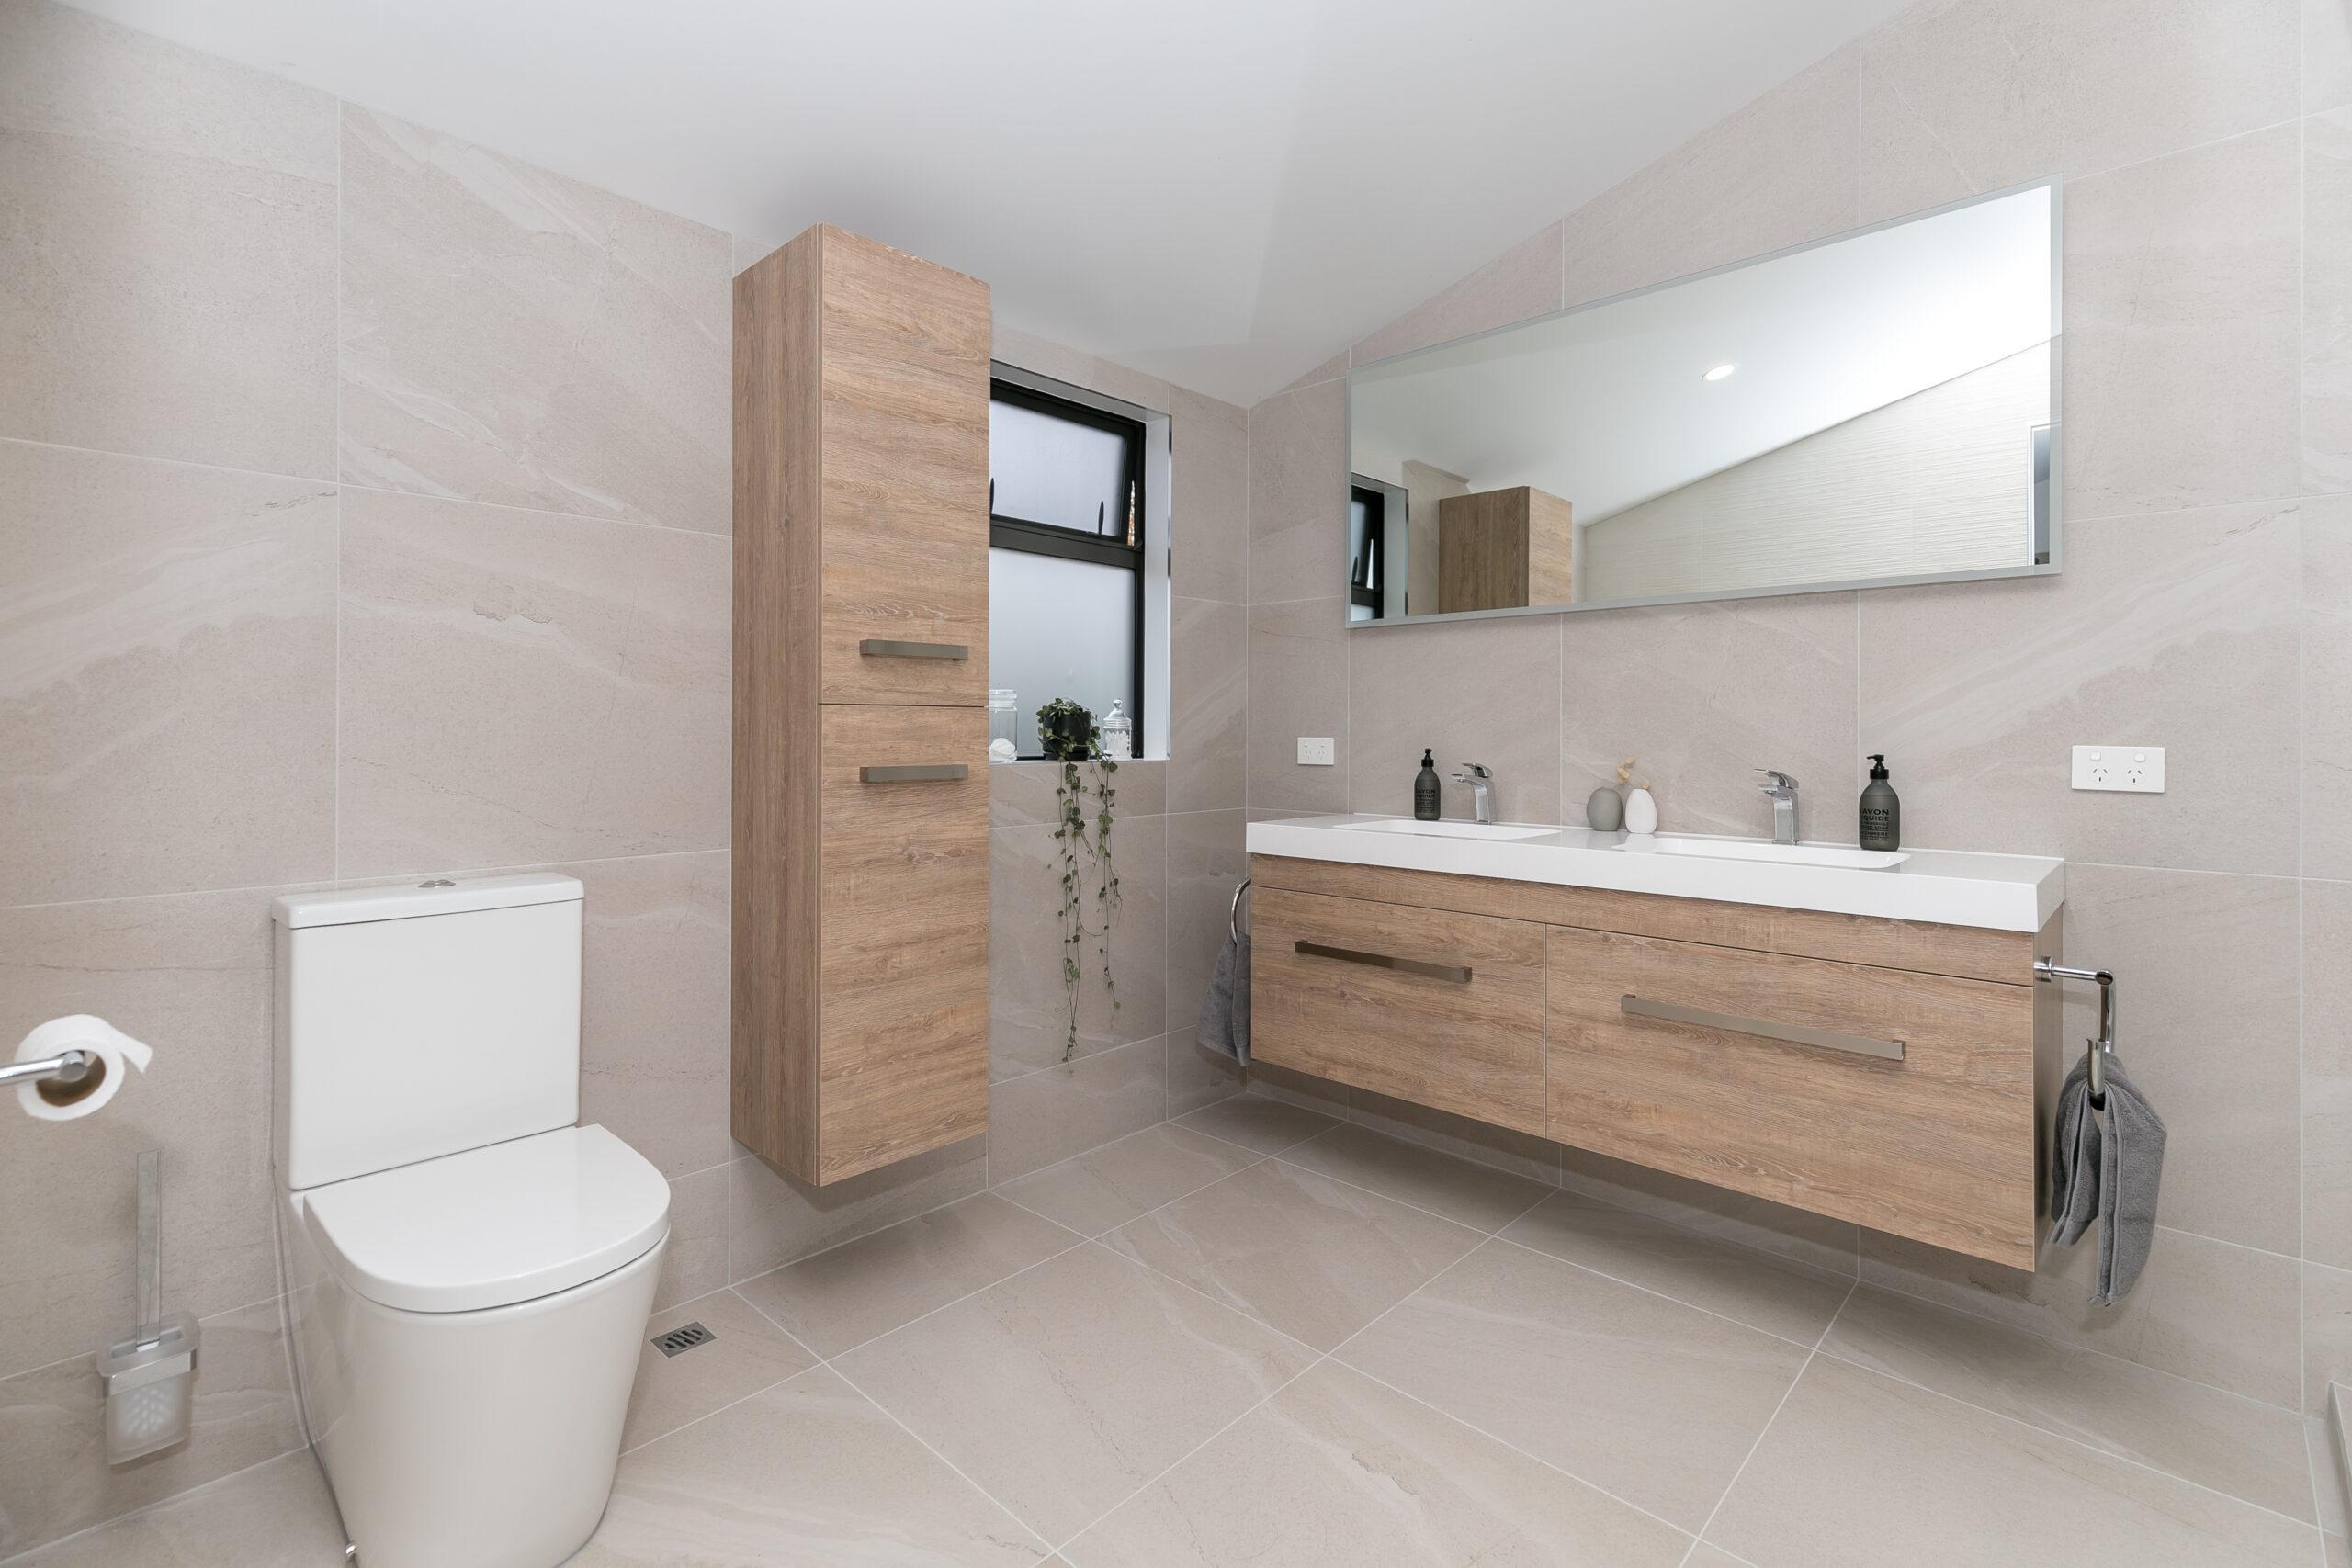 Bathroom Renovation – Design for Functionality